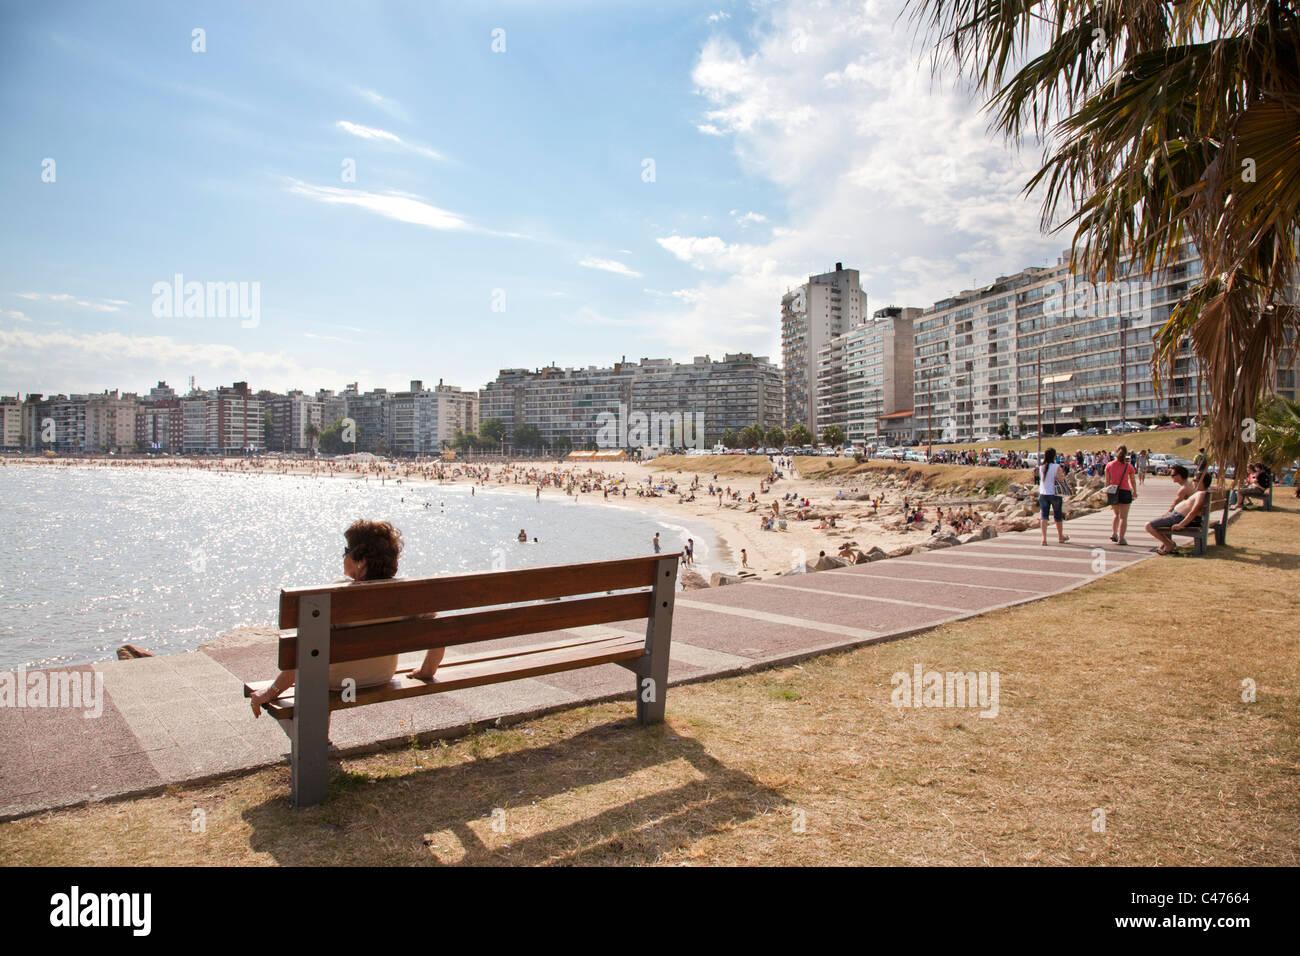 Playa Pocitos, City Beach, Montevideo, Uruguay. - Stock Image